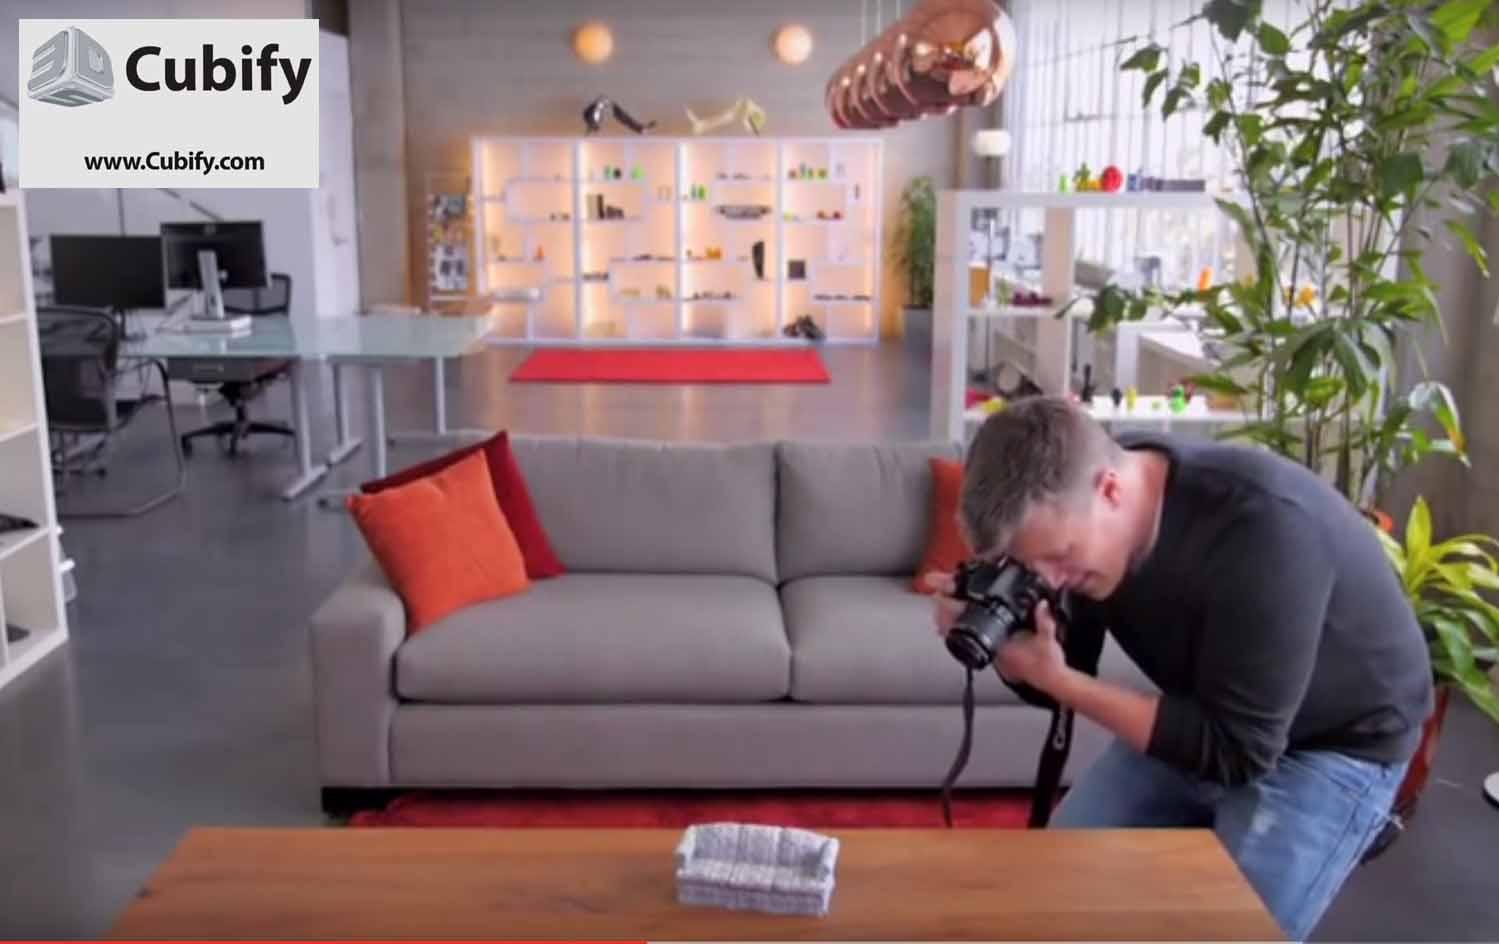 cubify-capture-13